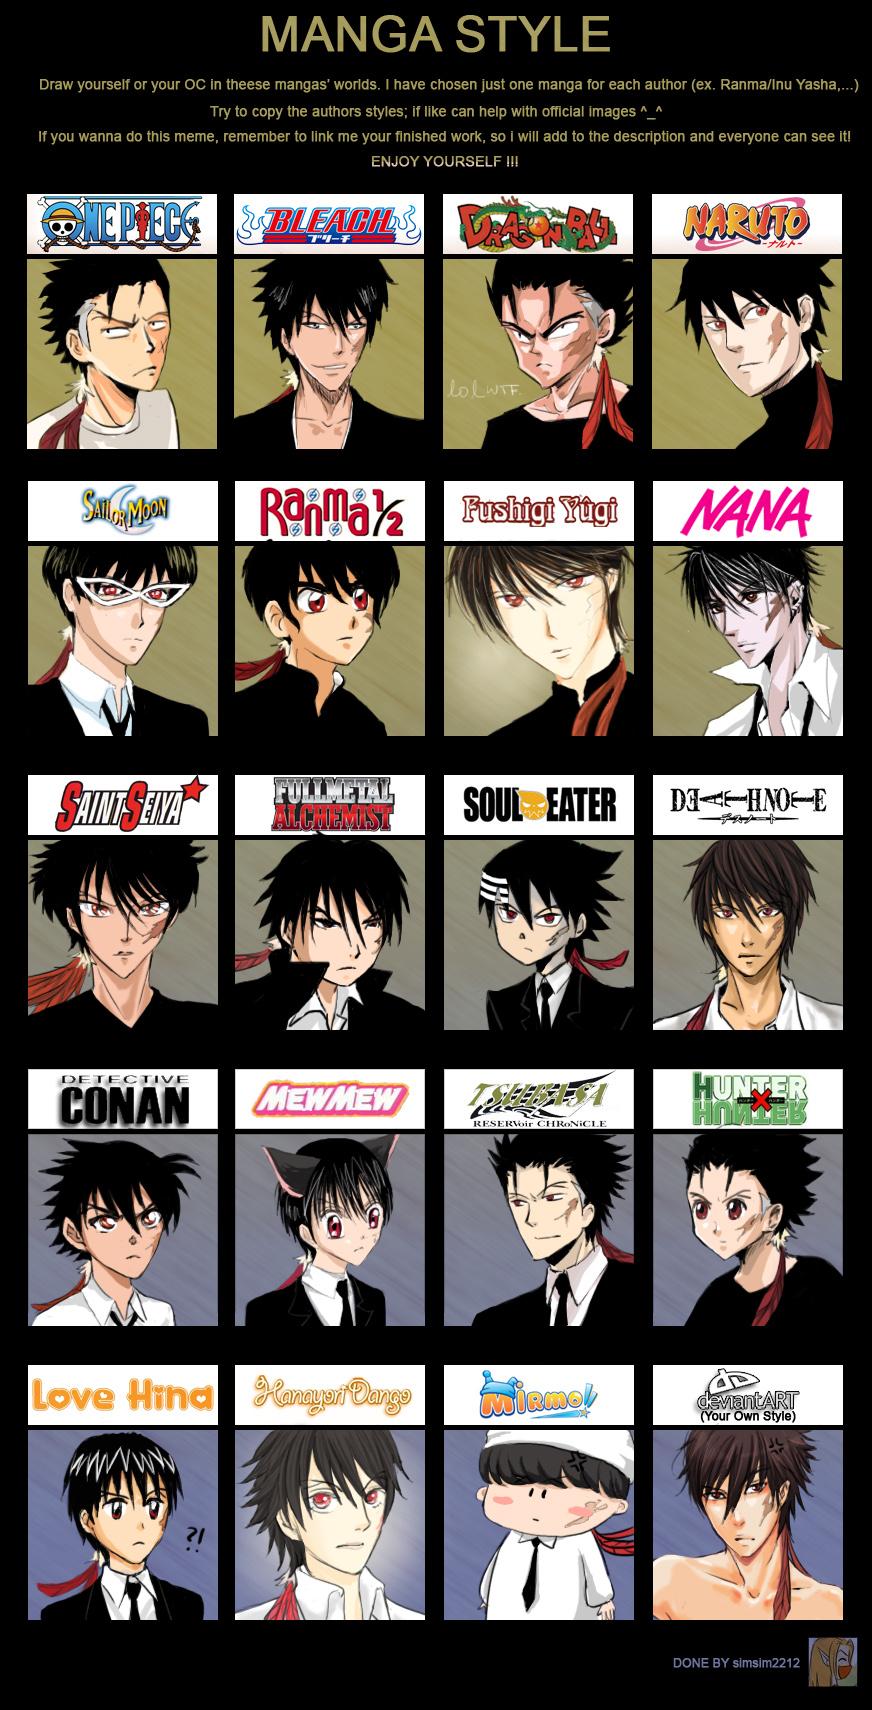 Manga Style Meme Boss ver. by kayoru